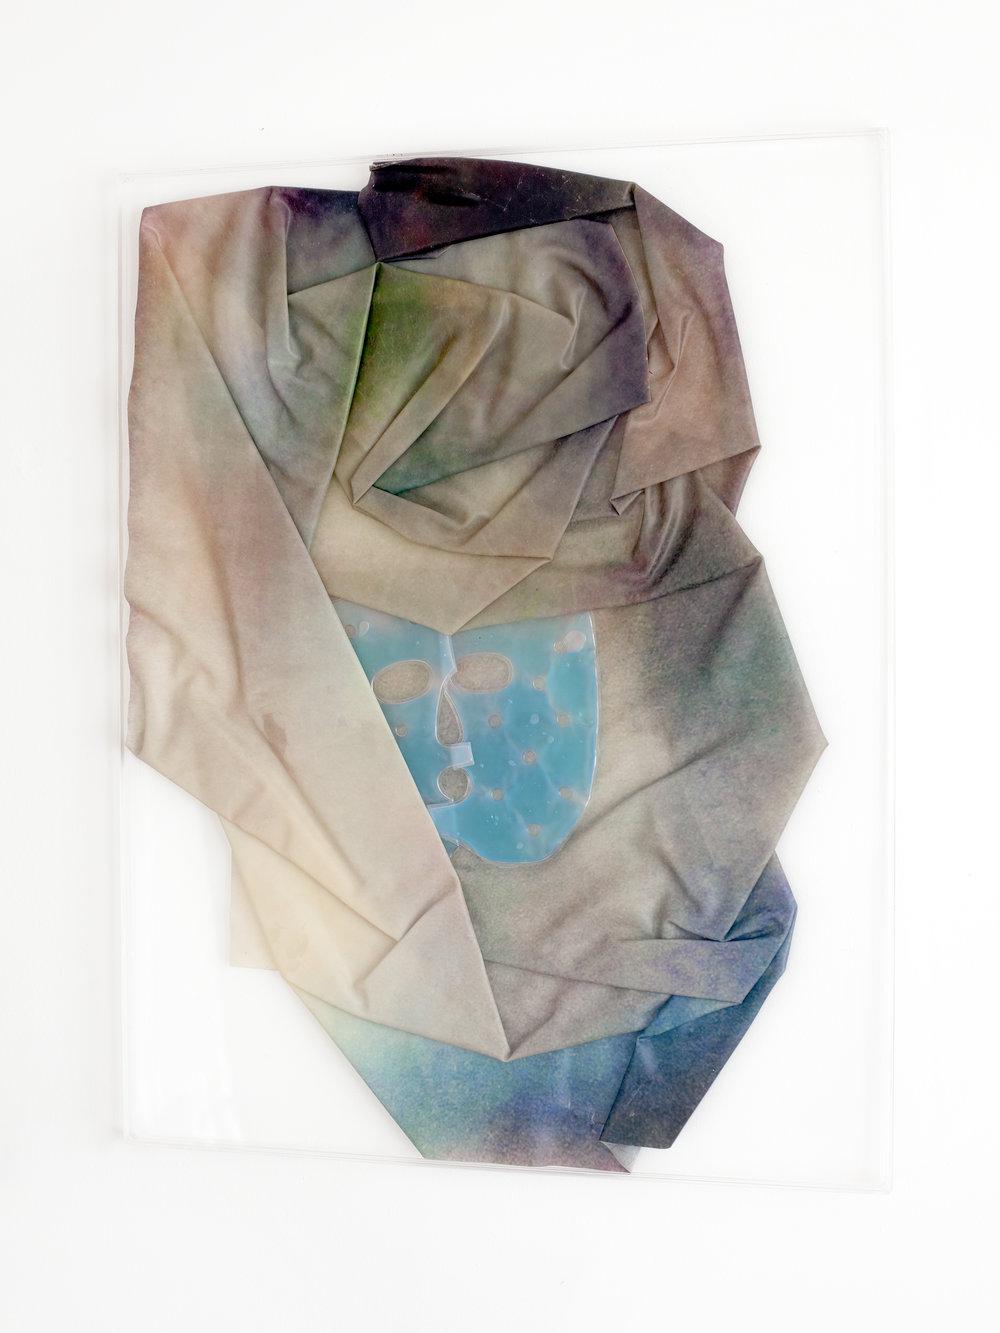 BLISSTER, 2018, sculpture (unique), 70 X 55 X 1,6 cm, inkjetprint on latex, transparent acrylic, face gel mask